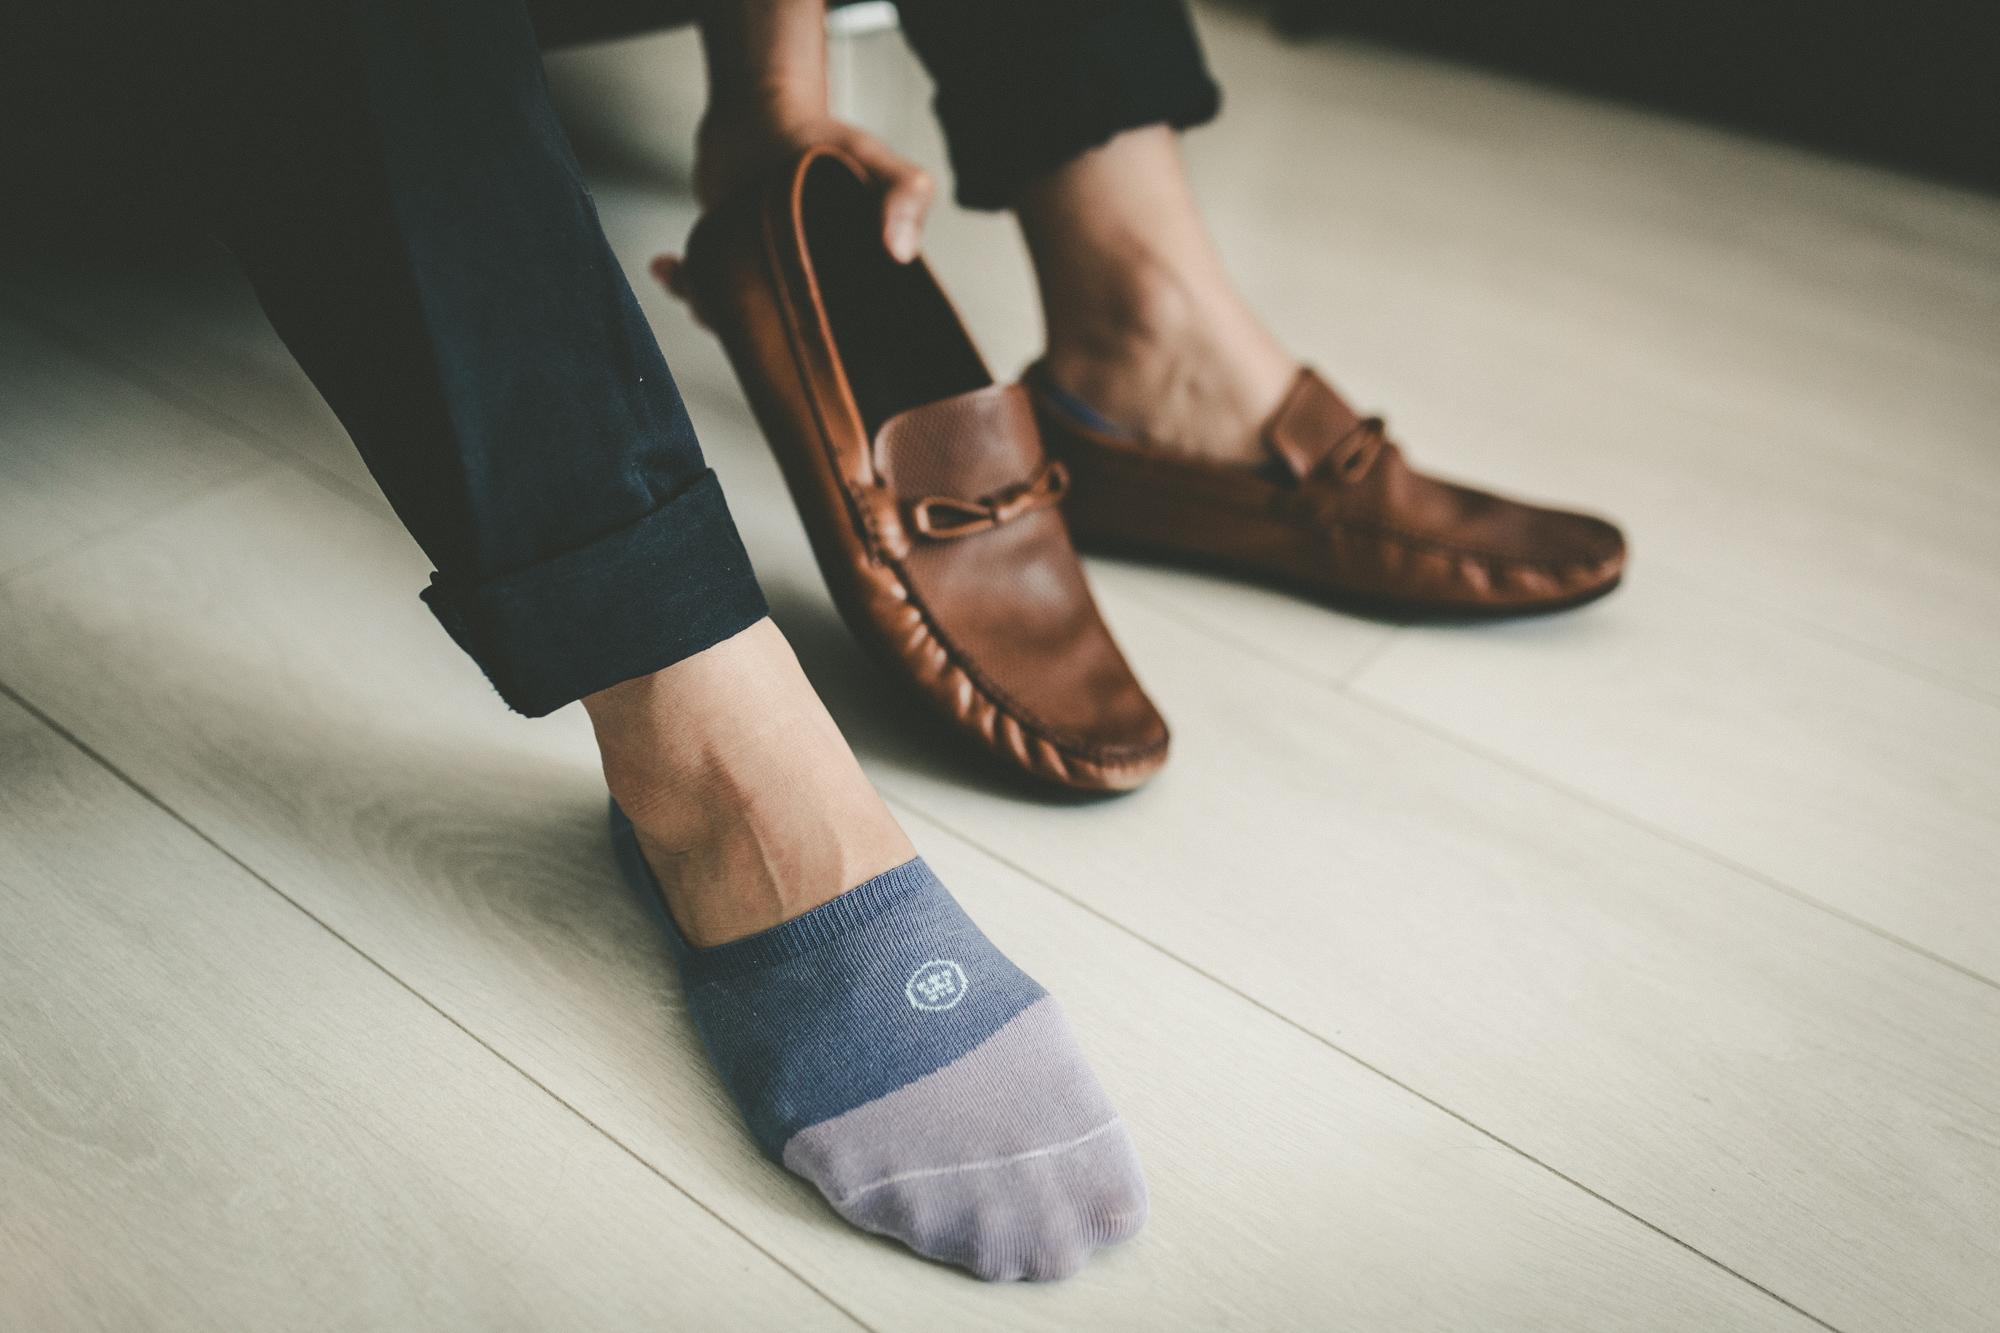 feets-5.jpg